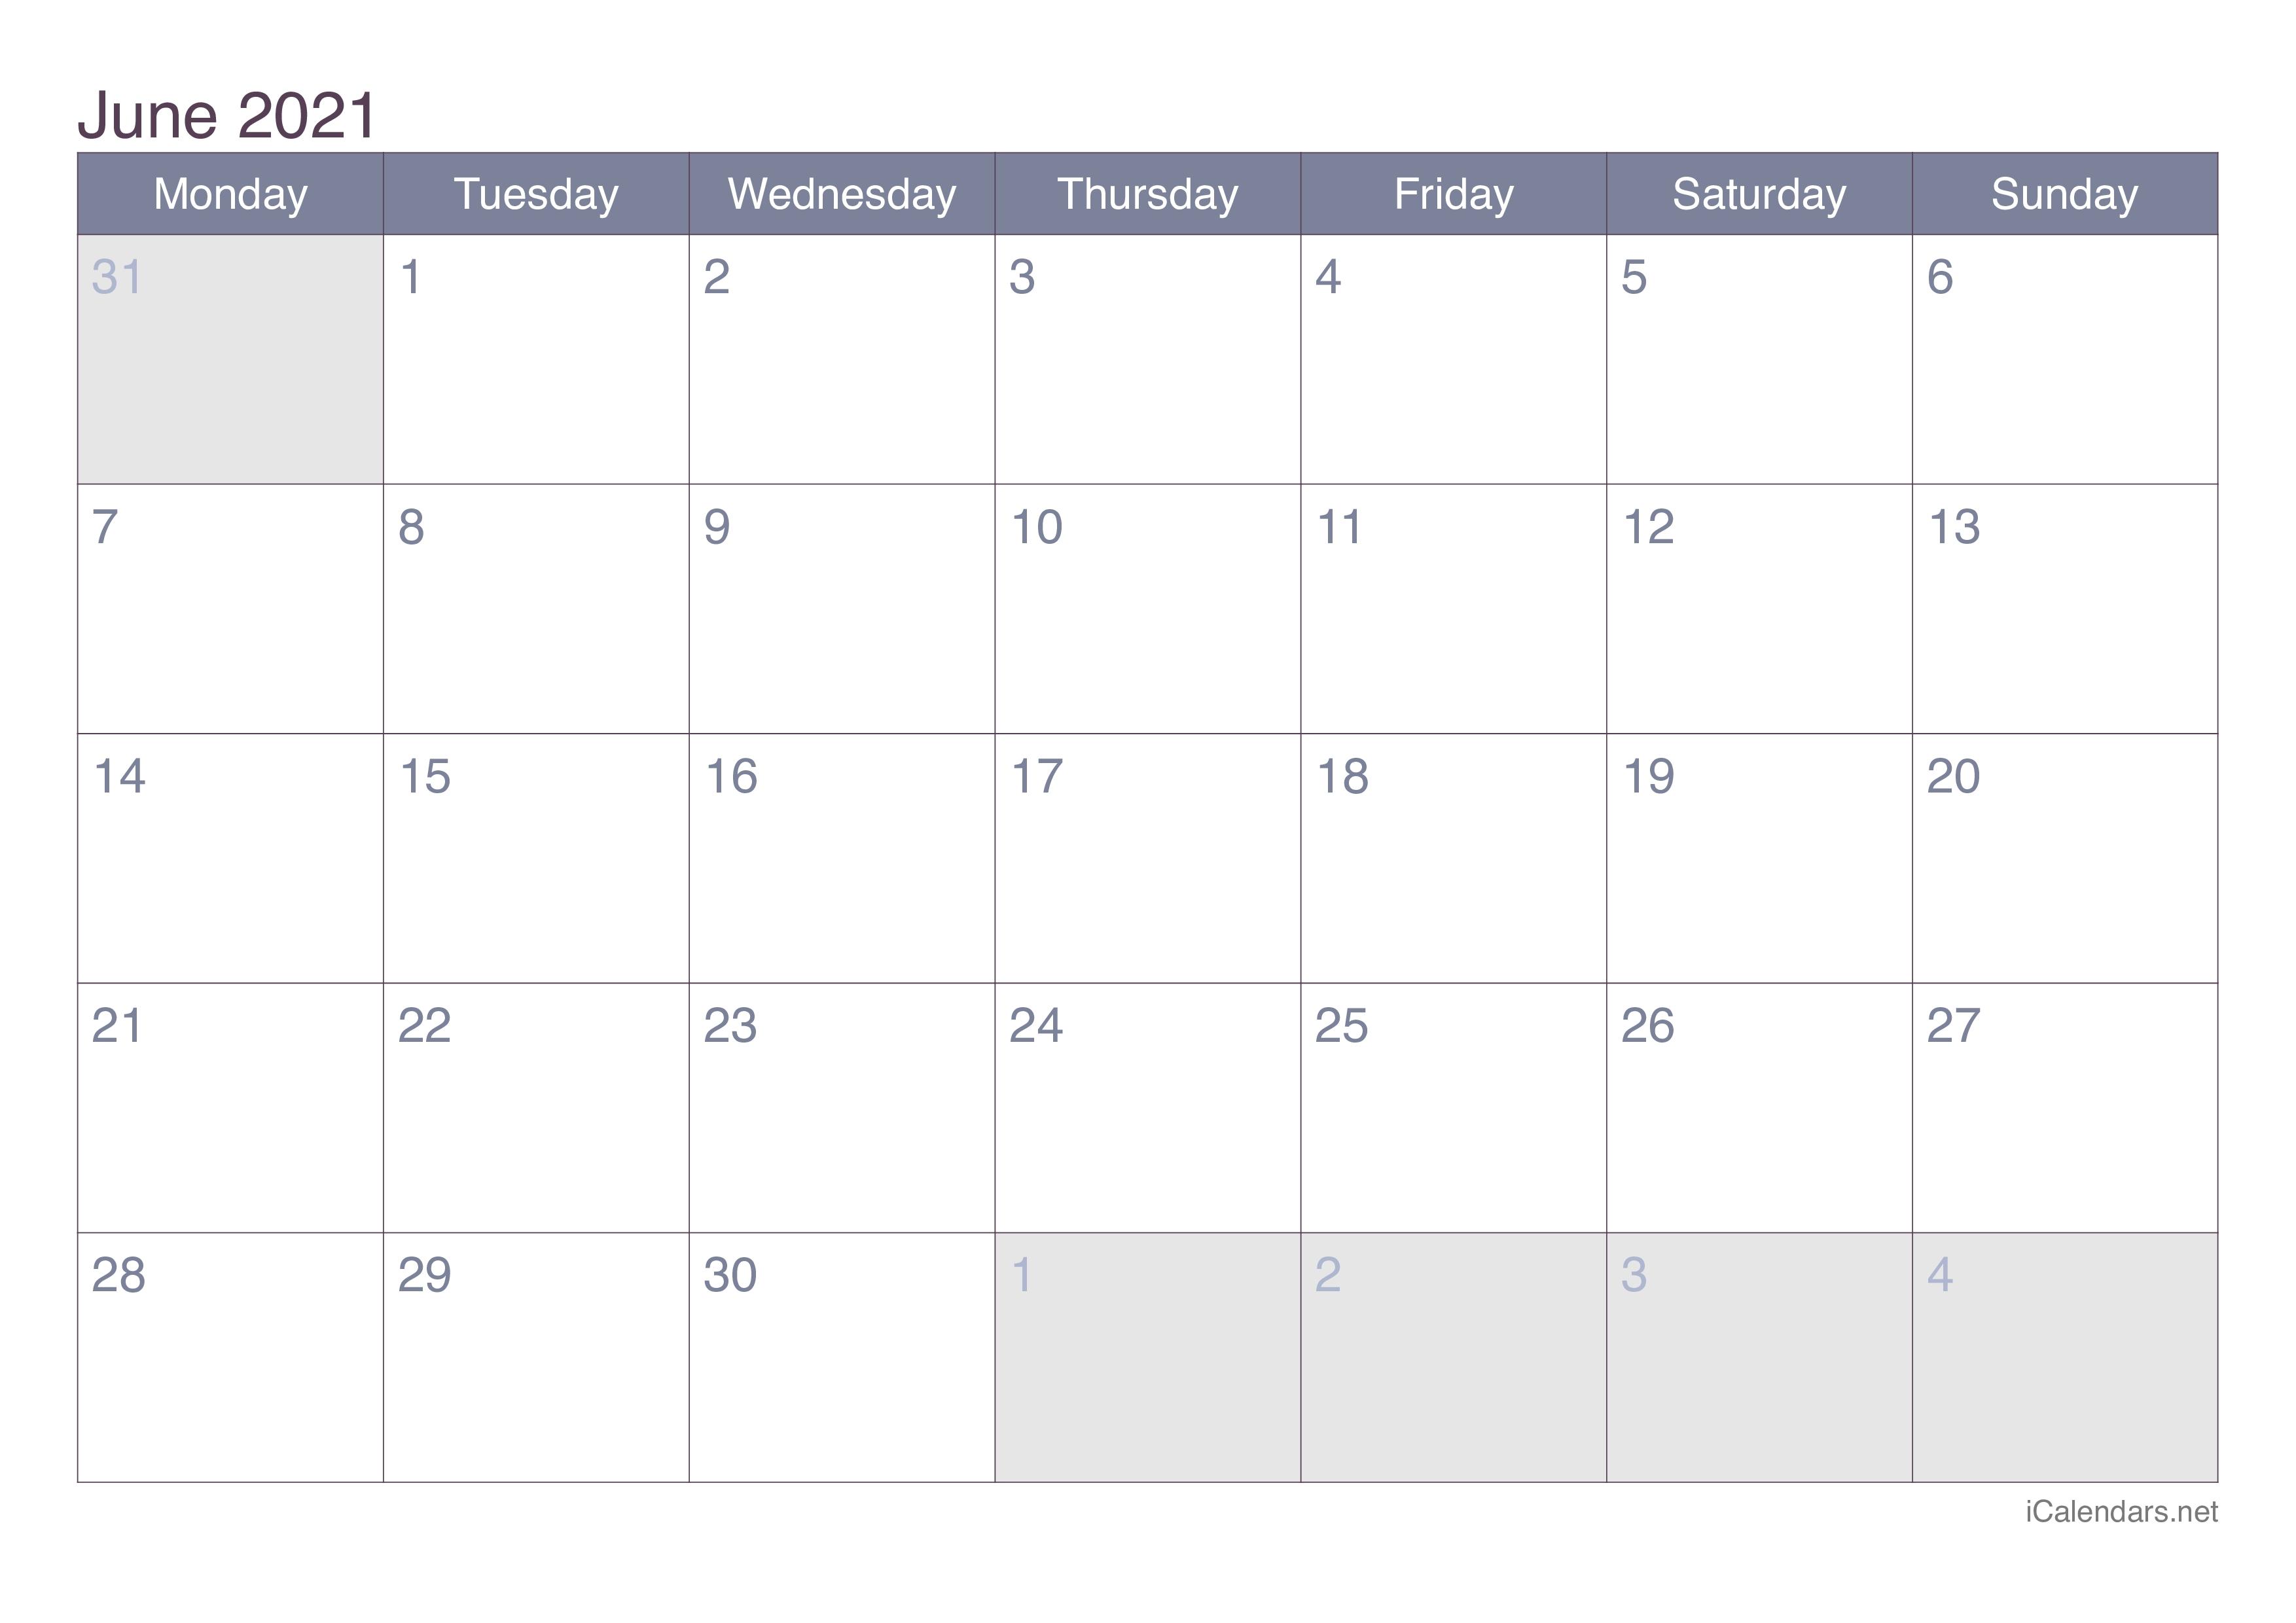 June 2021 Printable Calendar - Icalendars June 2021 Calendar In Excel